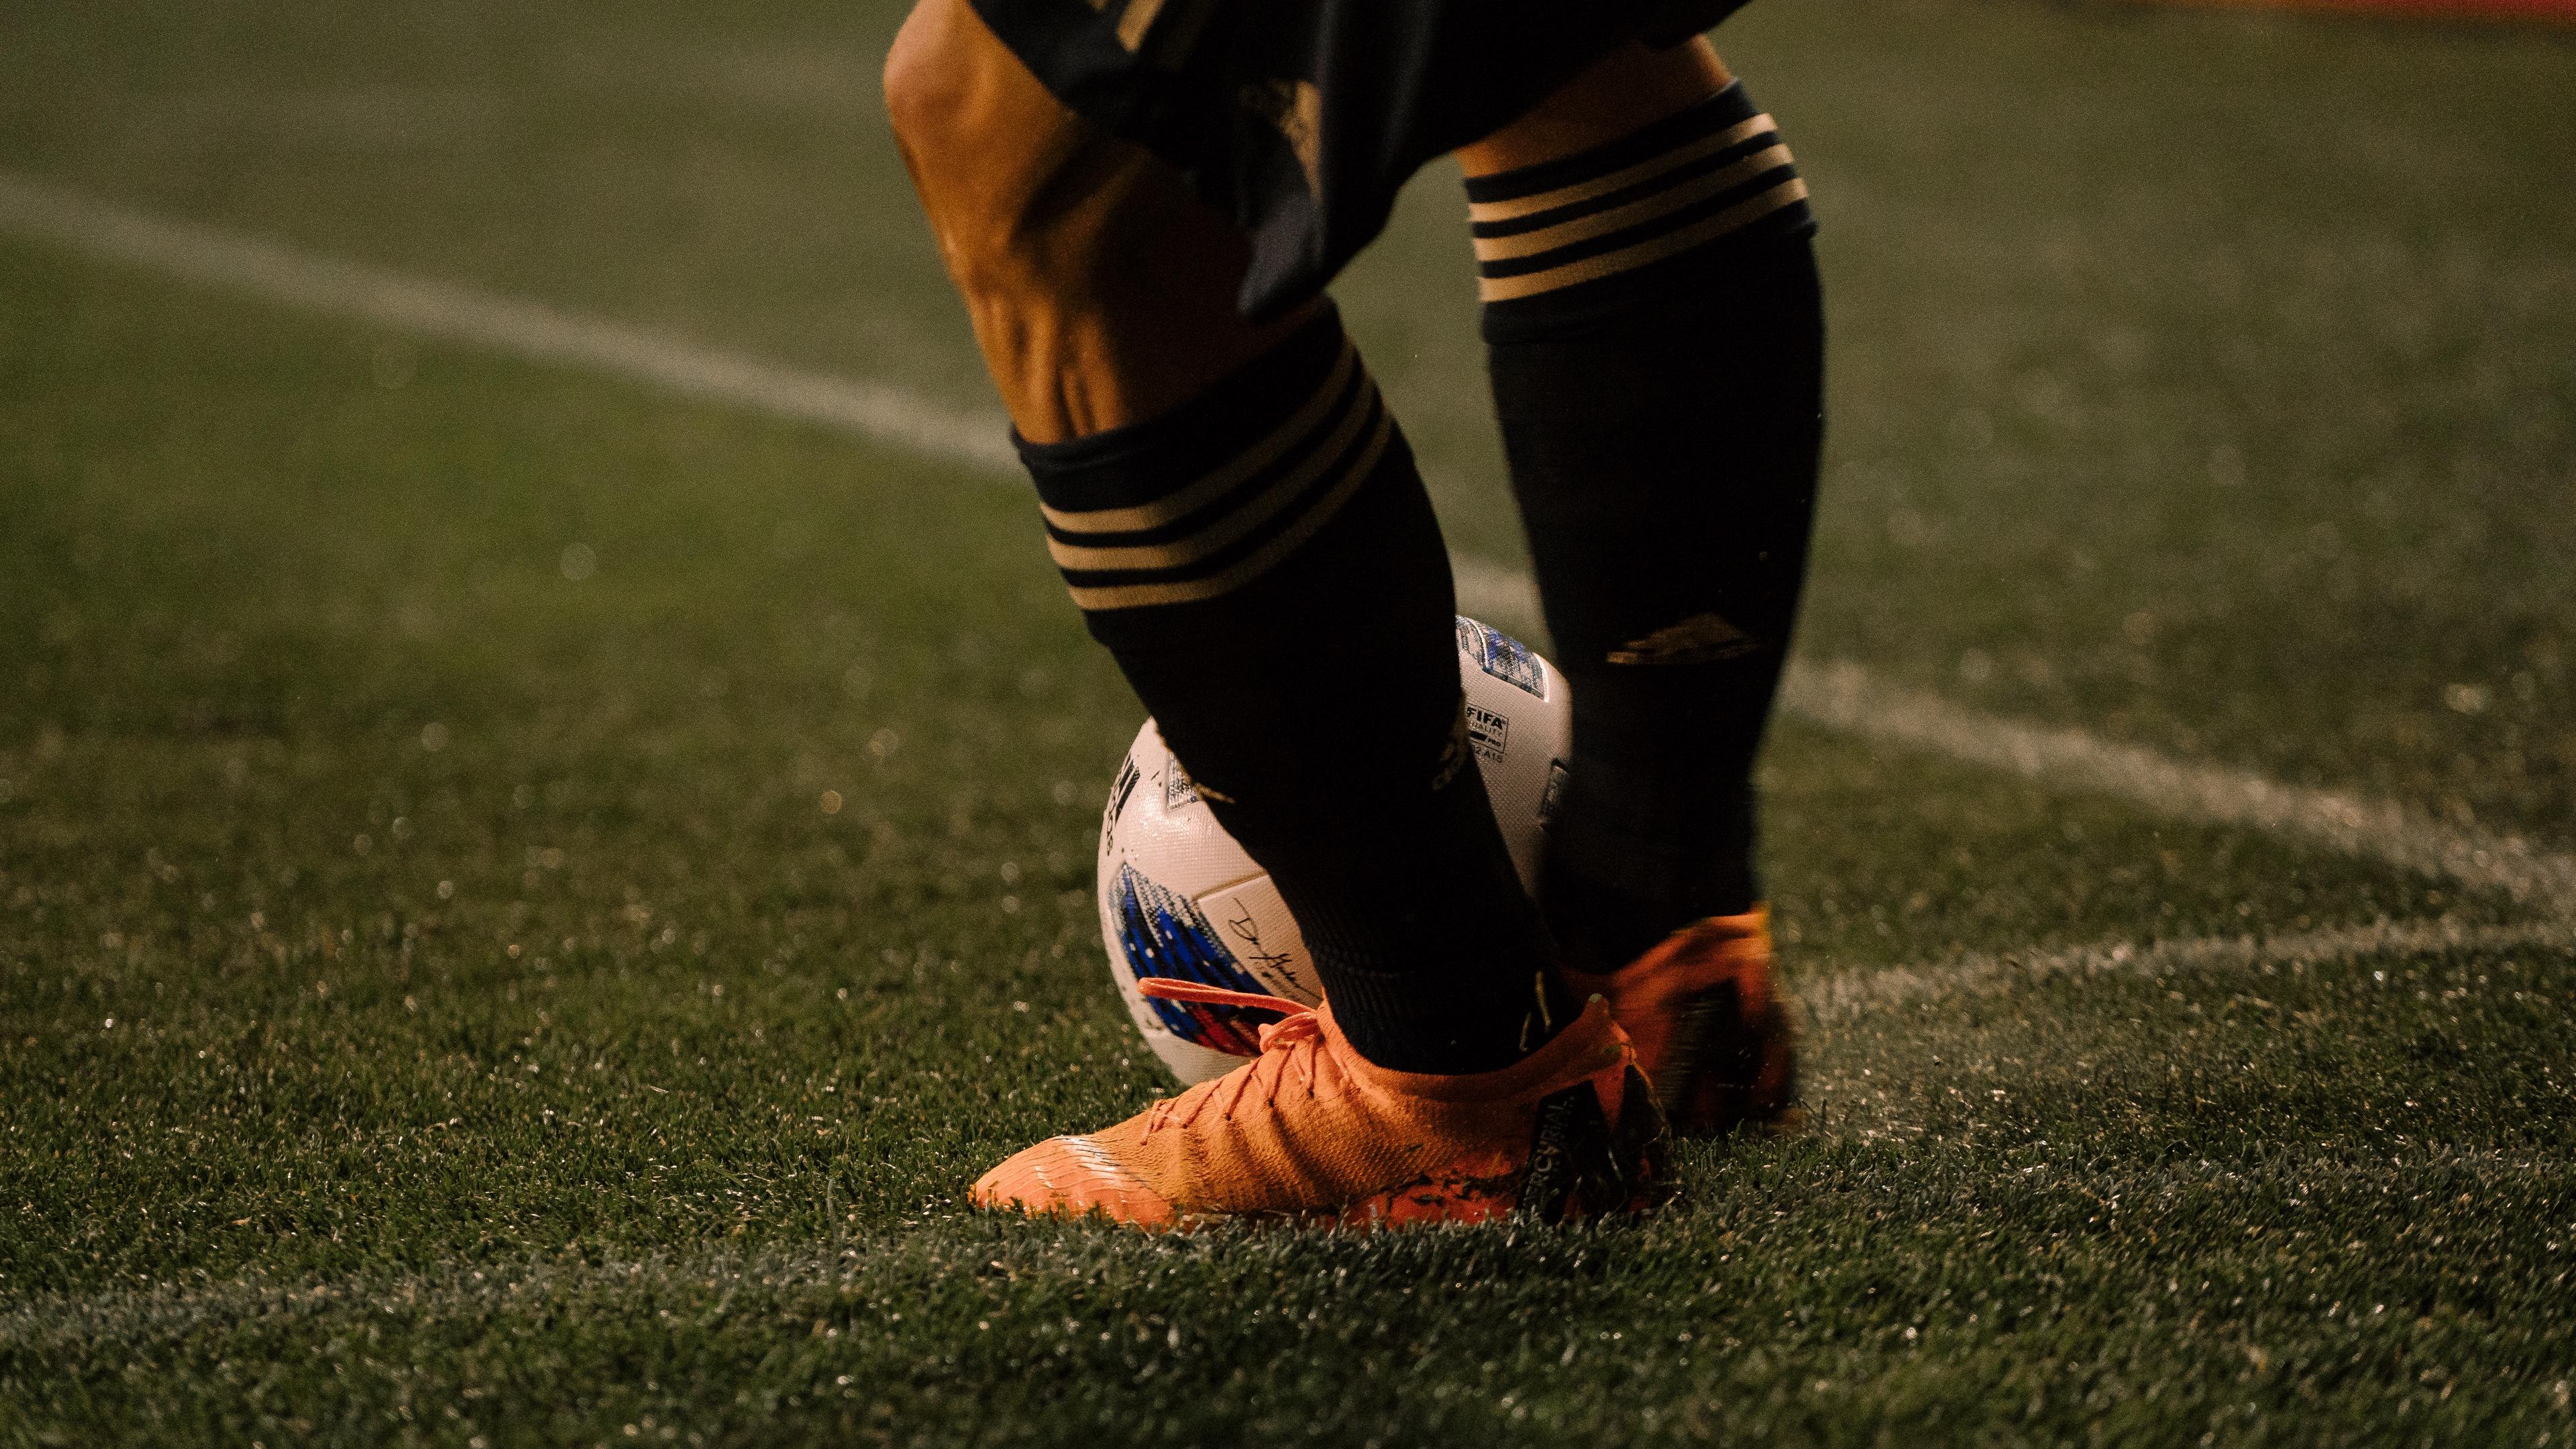 footballer ball football boots lawn half hose 4k 1540061047 - footballer, ball, football boots, lawn, half-hose 4k - footballer, football boots, Ball